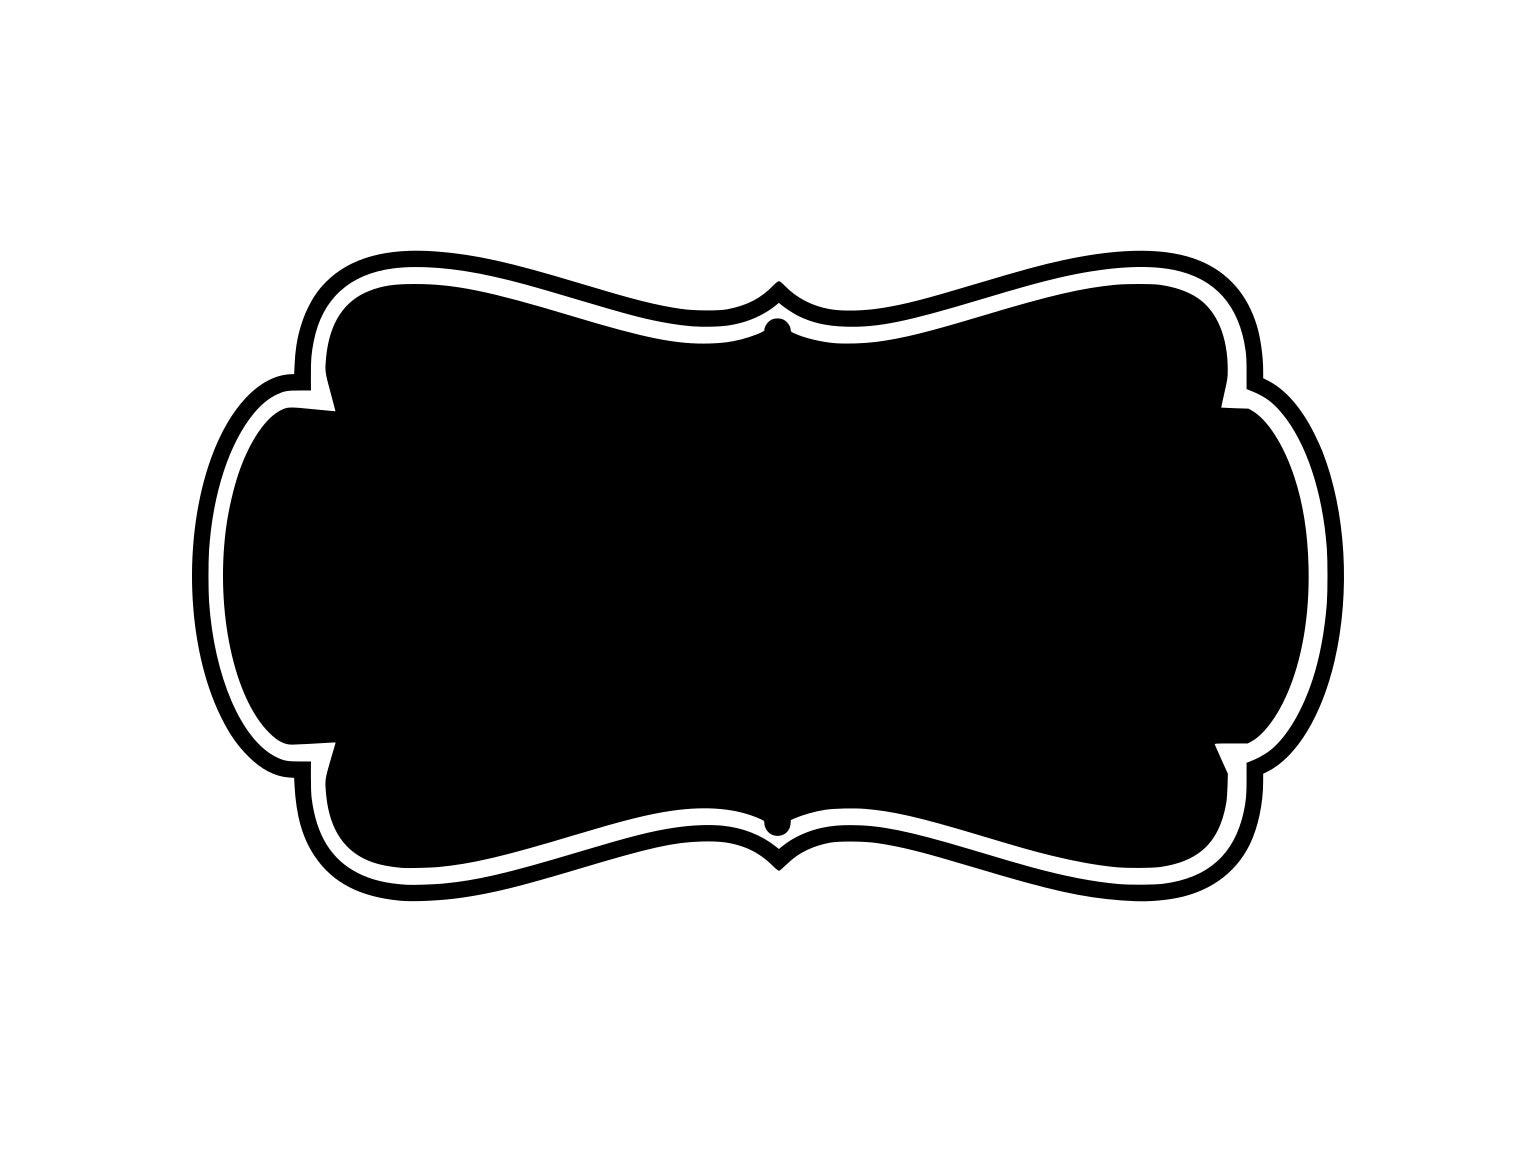 label frame svg label frame clipart frame clipart svg frame | etsy